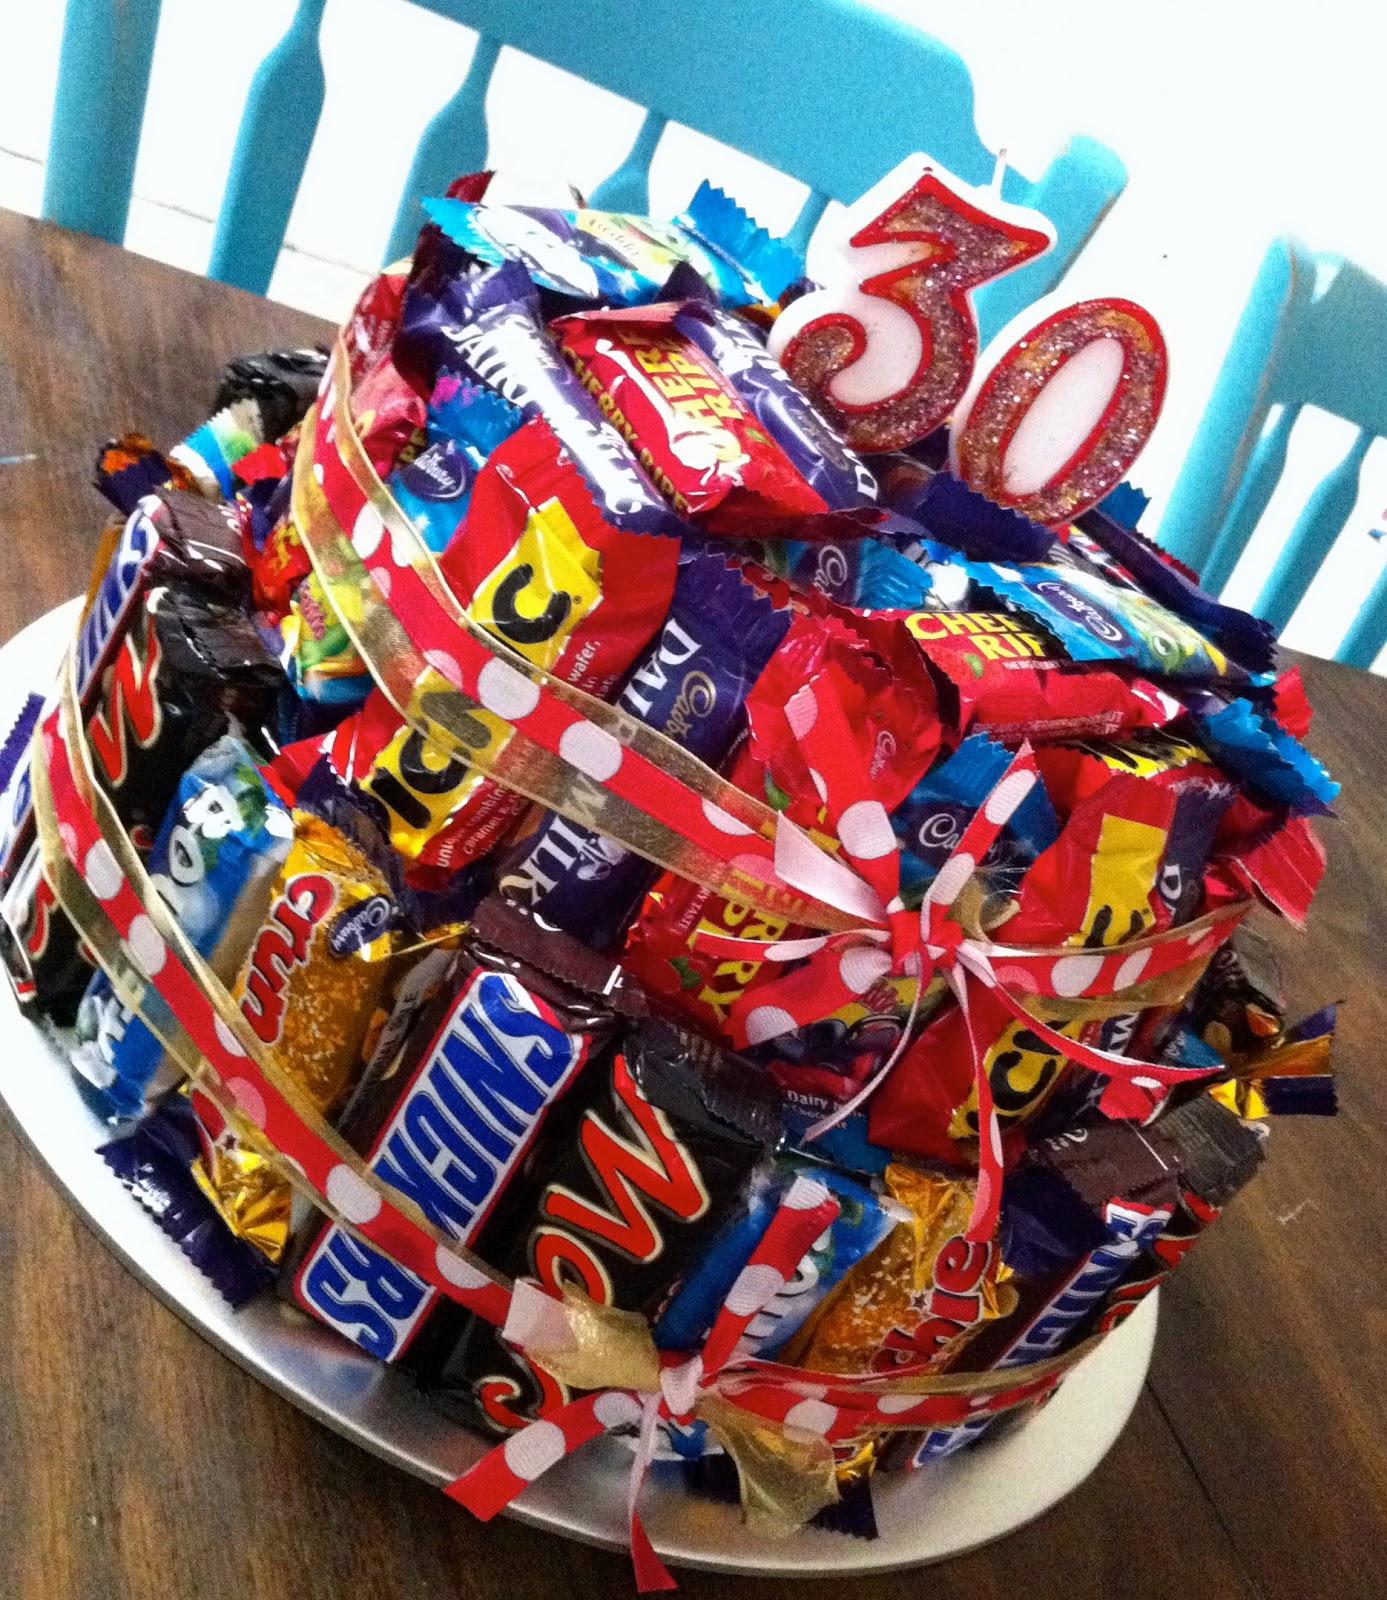 wonderful How To Make A Candy Bar Cake Bouquet Part - 14: Chocolate Bar Chocolate u0027Cakeu0027